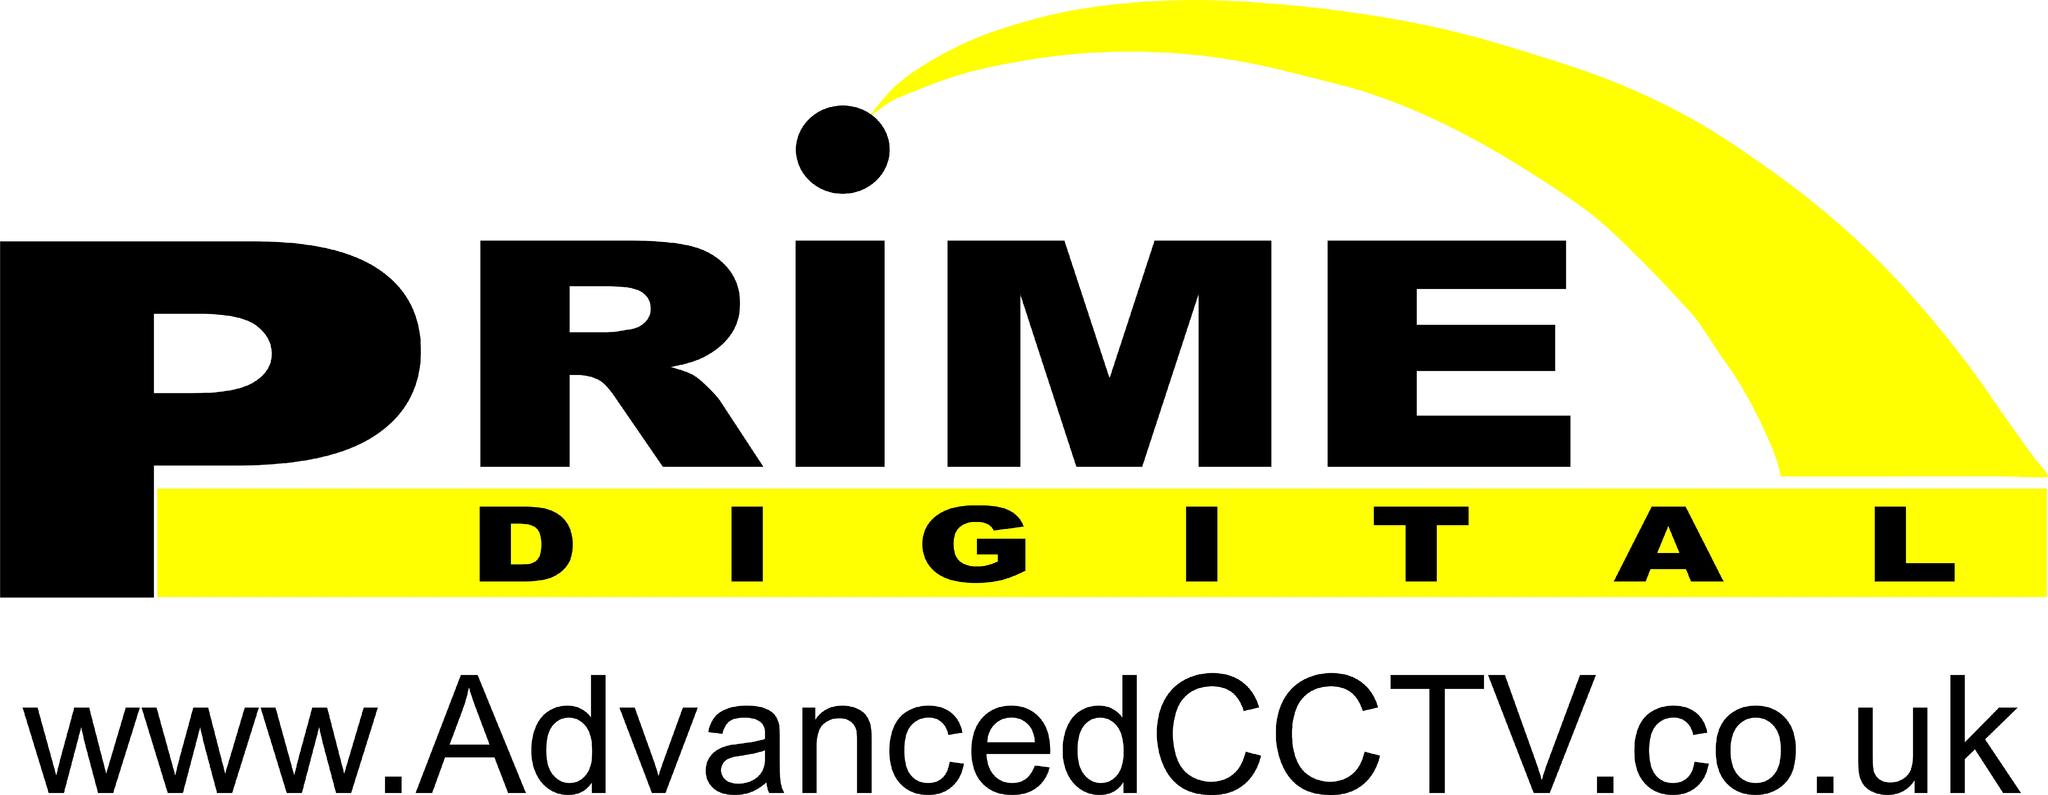 Advanced CCTV from Prime Digital